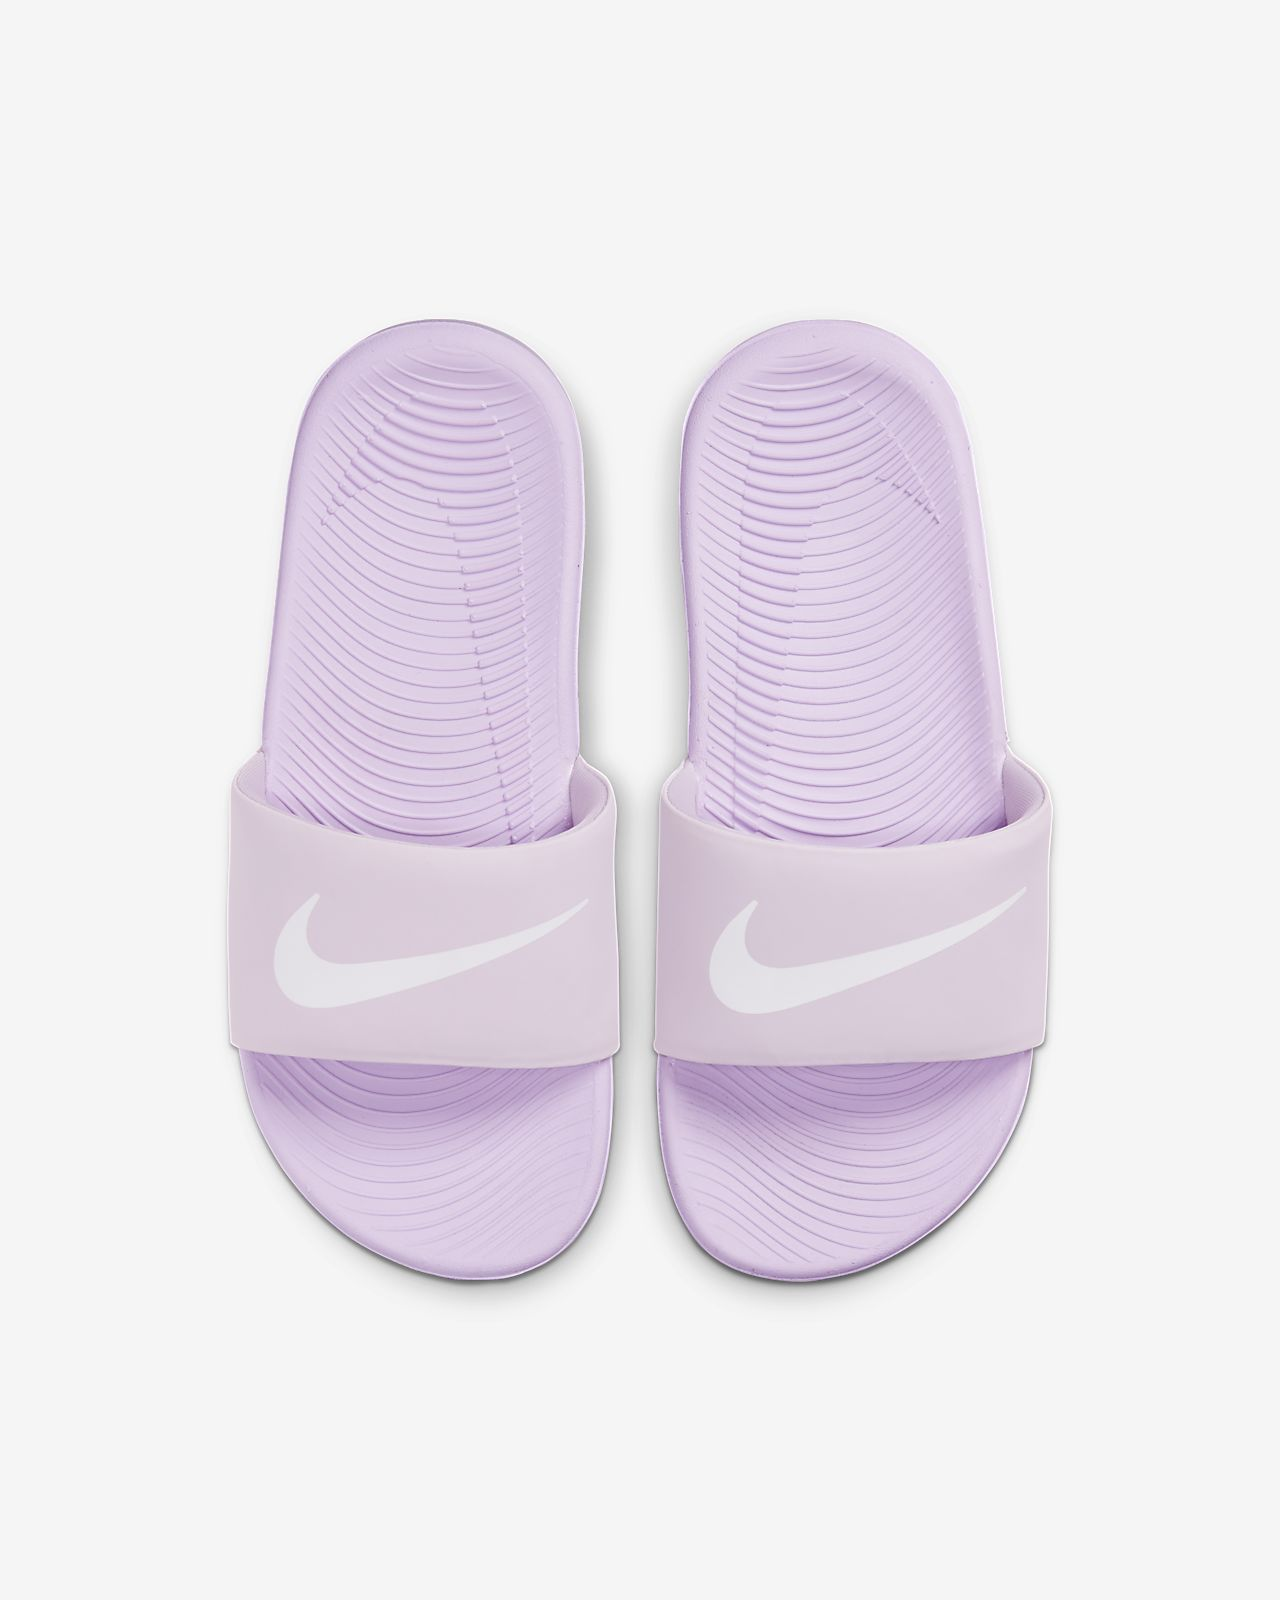 Nike Kawa Xancletes - Nen/a i nen/a petit/a